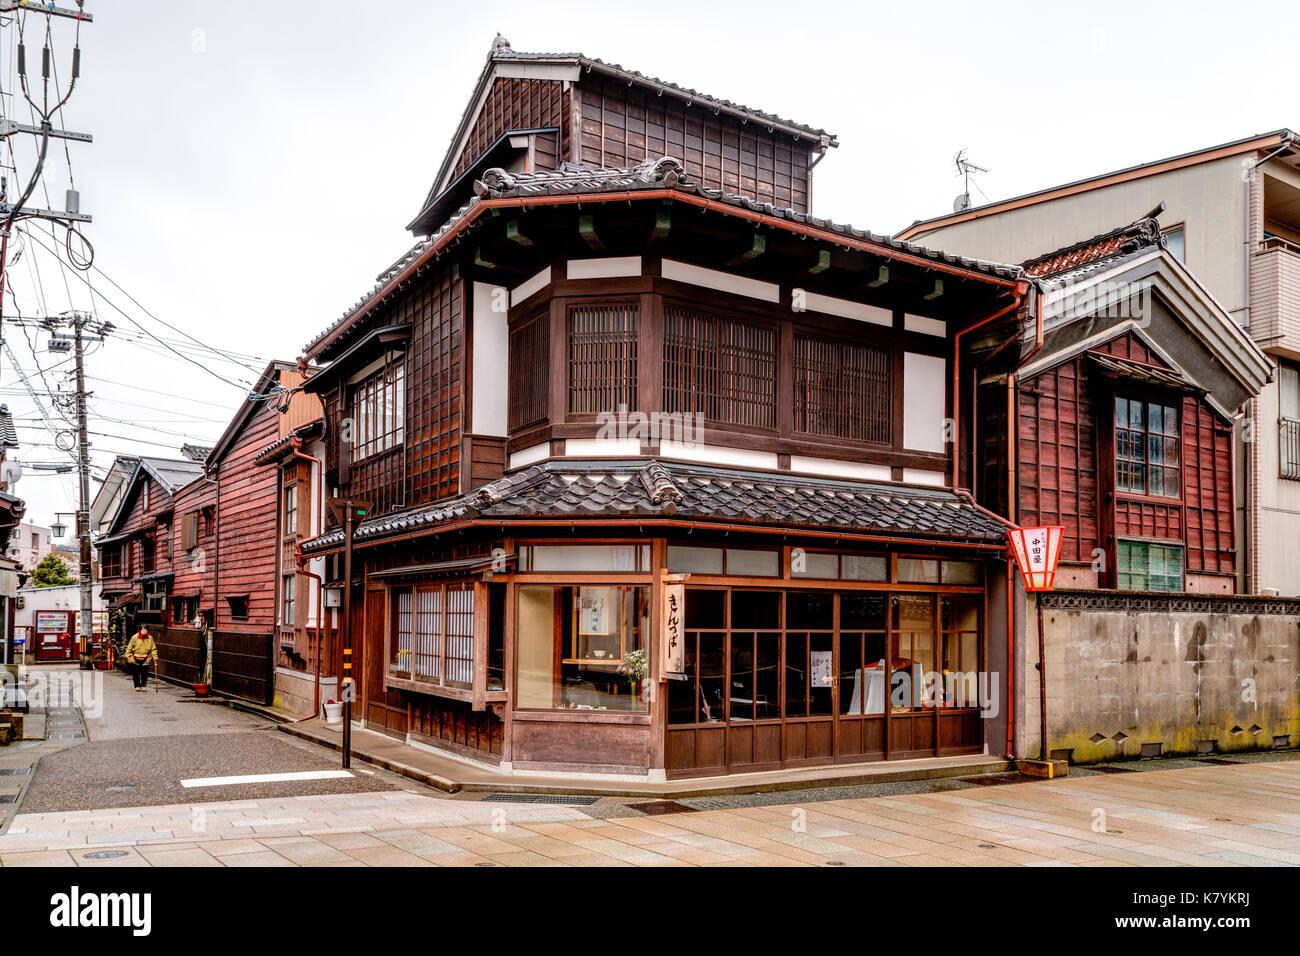 Chaya Japanese Restaurant